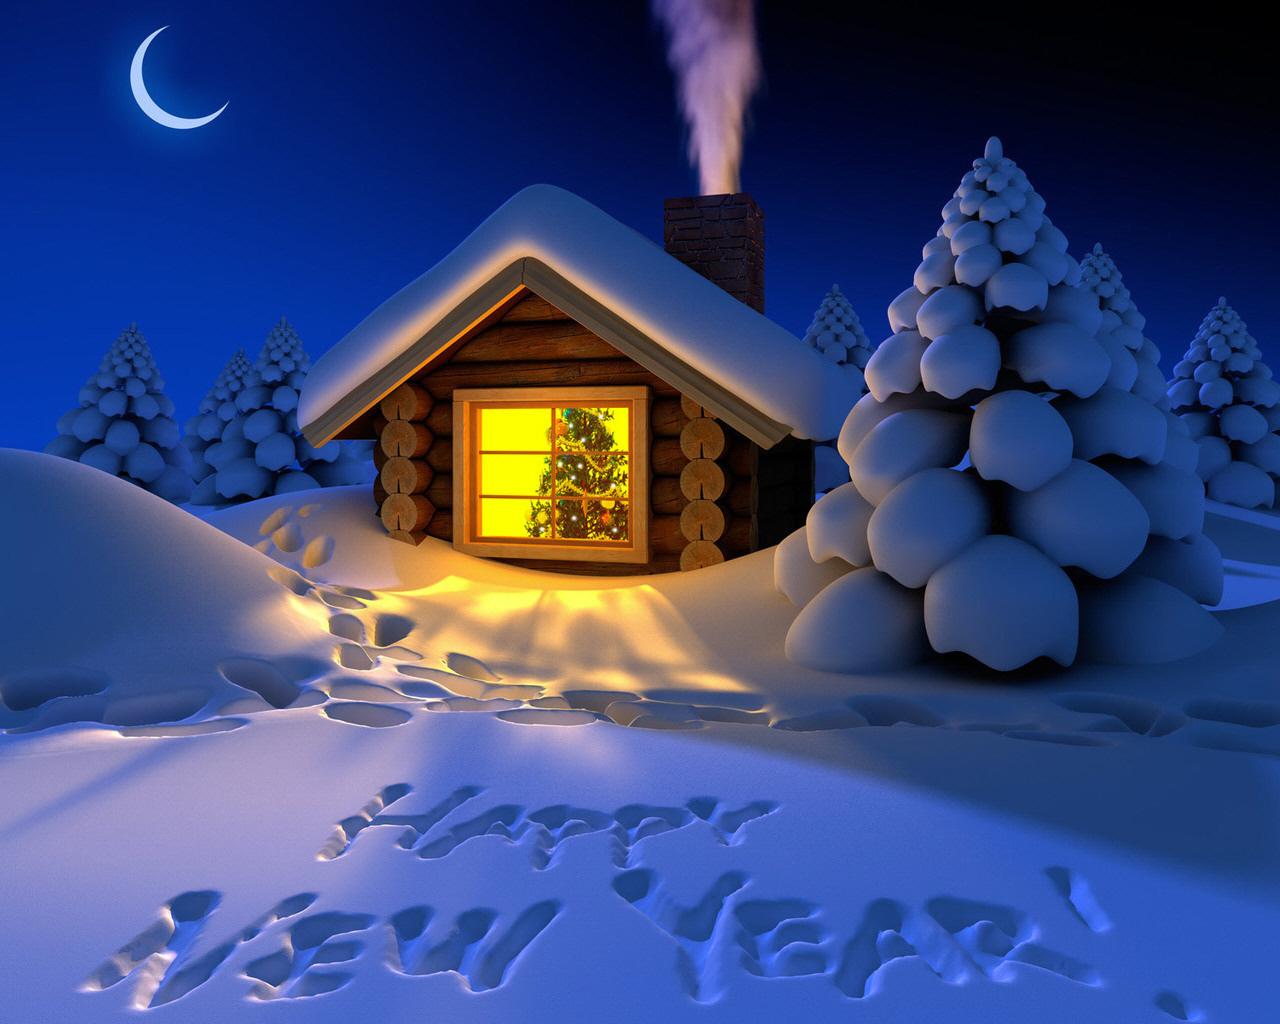 Best Desktop HD Wallpaper   Happy New Year Photo Desktop 1280x1024